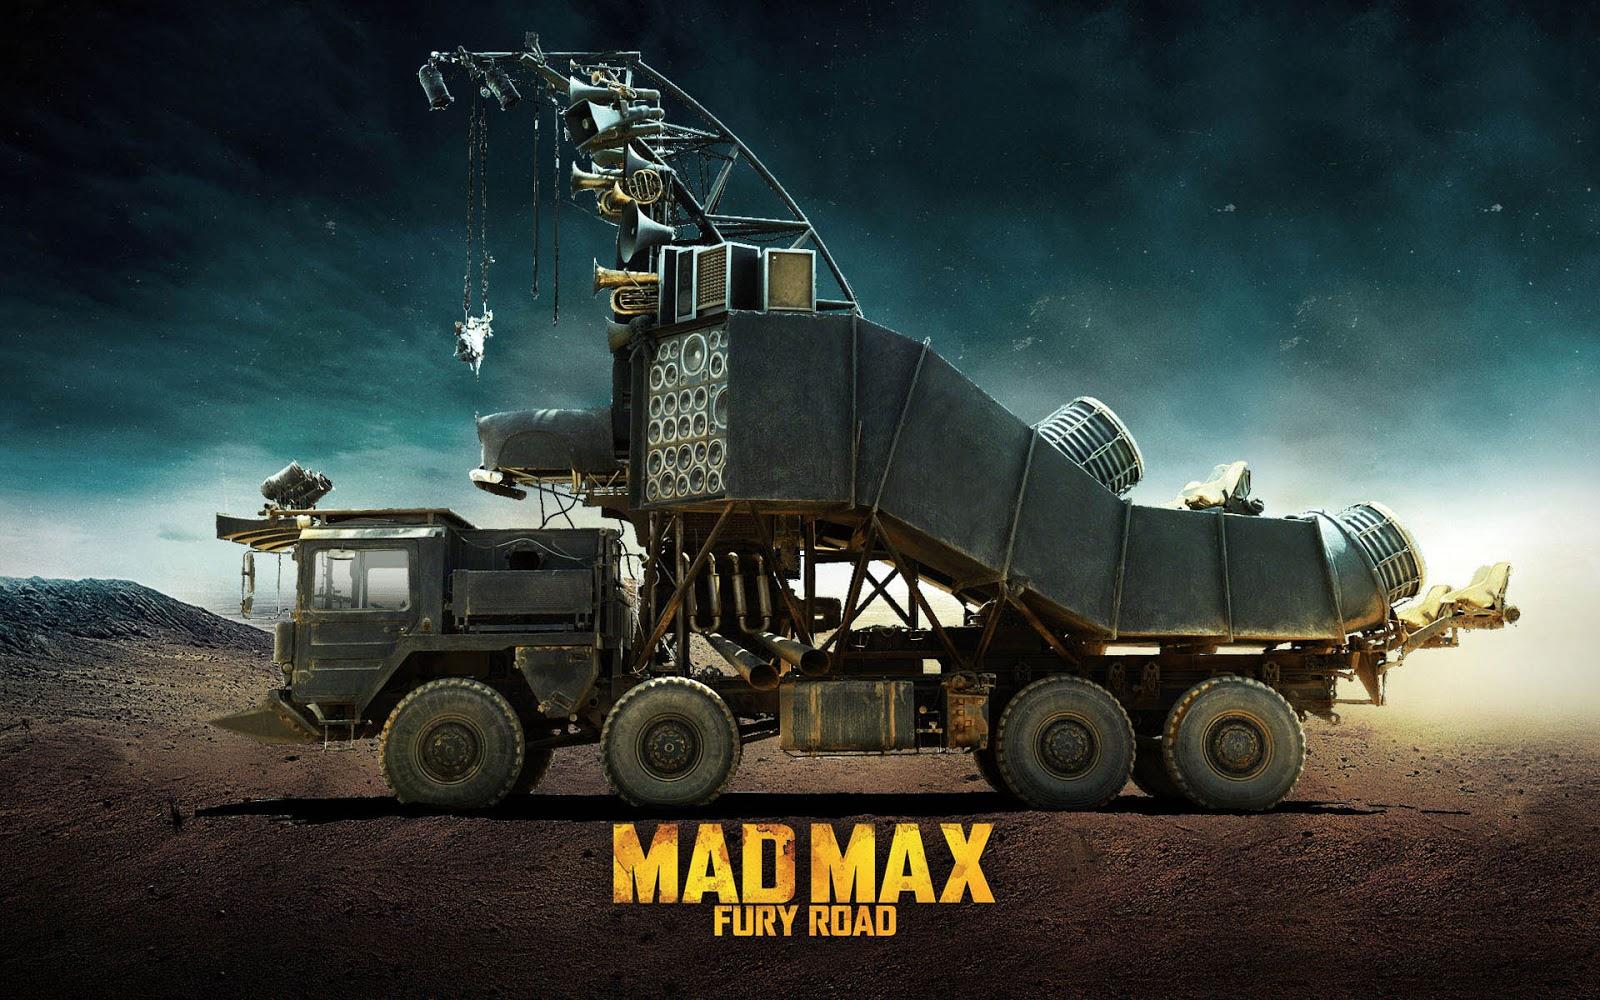 doof wagon mad max fury road wallpaper Απονέμουμε τα Όσκαρ αυτοκινήτου Fun, Jaguar C-X75, LYKAN HYPERSPORT, movie cars, videos, zblog